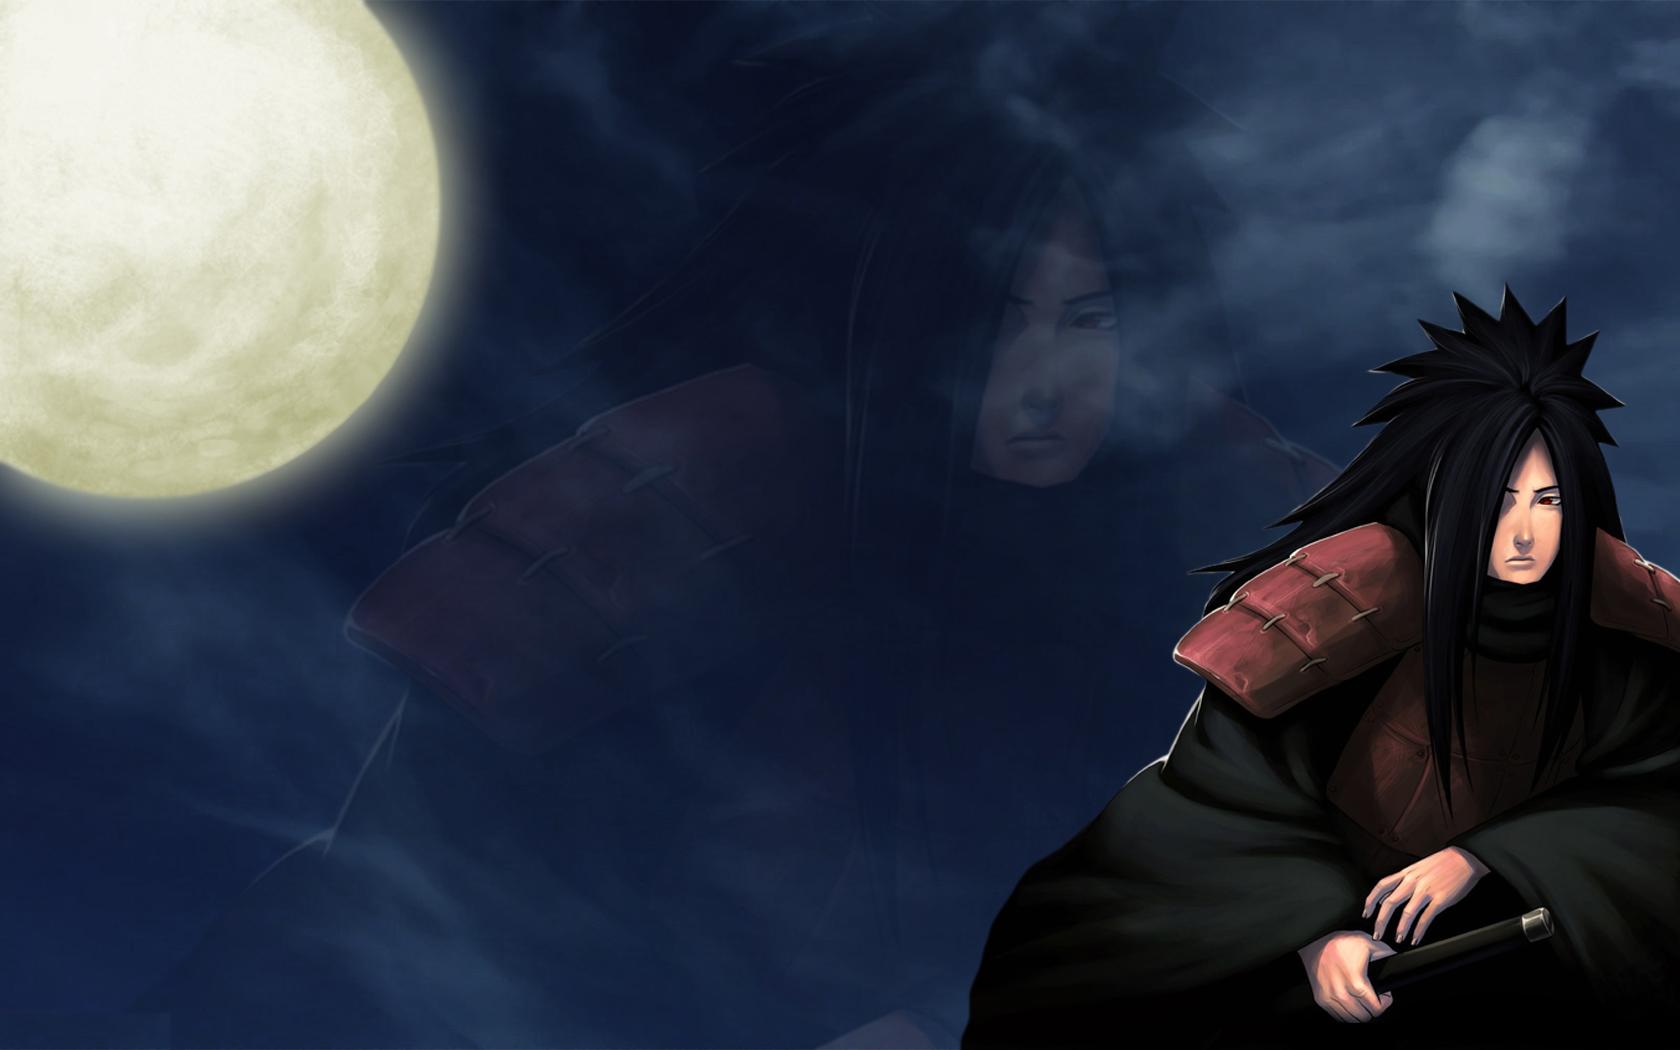 Clouds Moon Naruto Shippuden armor red eyes Uchiha Madara 1680x1050